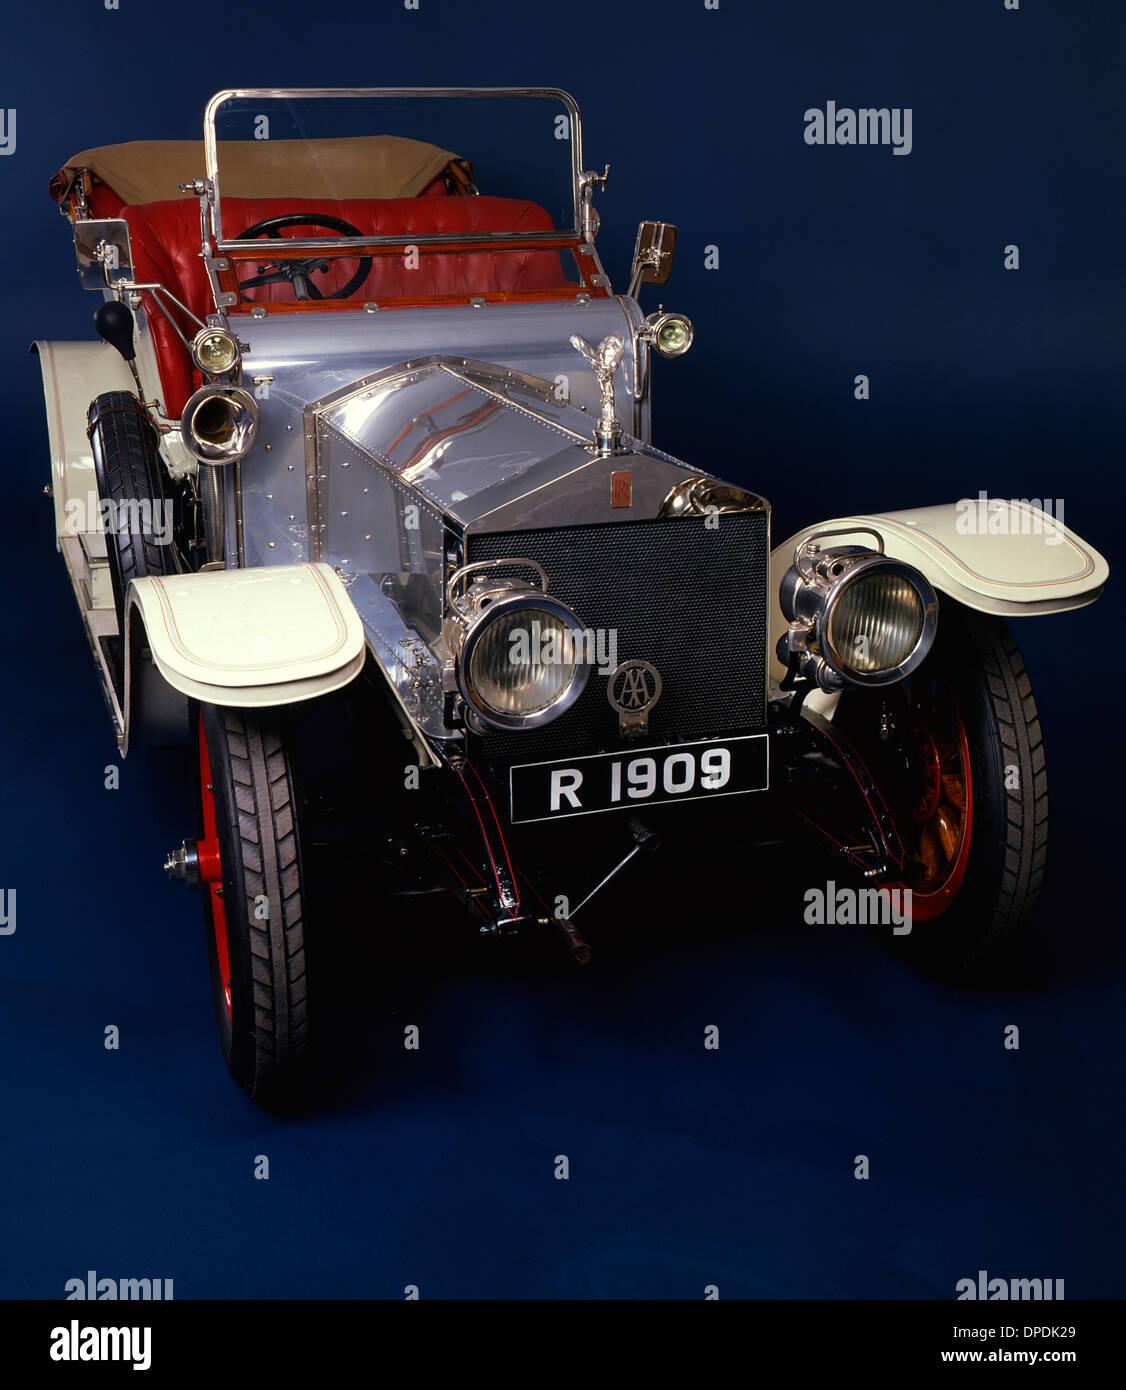 1909 Rolls Royce Silver Ghost - Stock Image